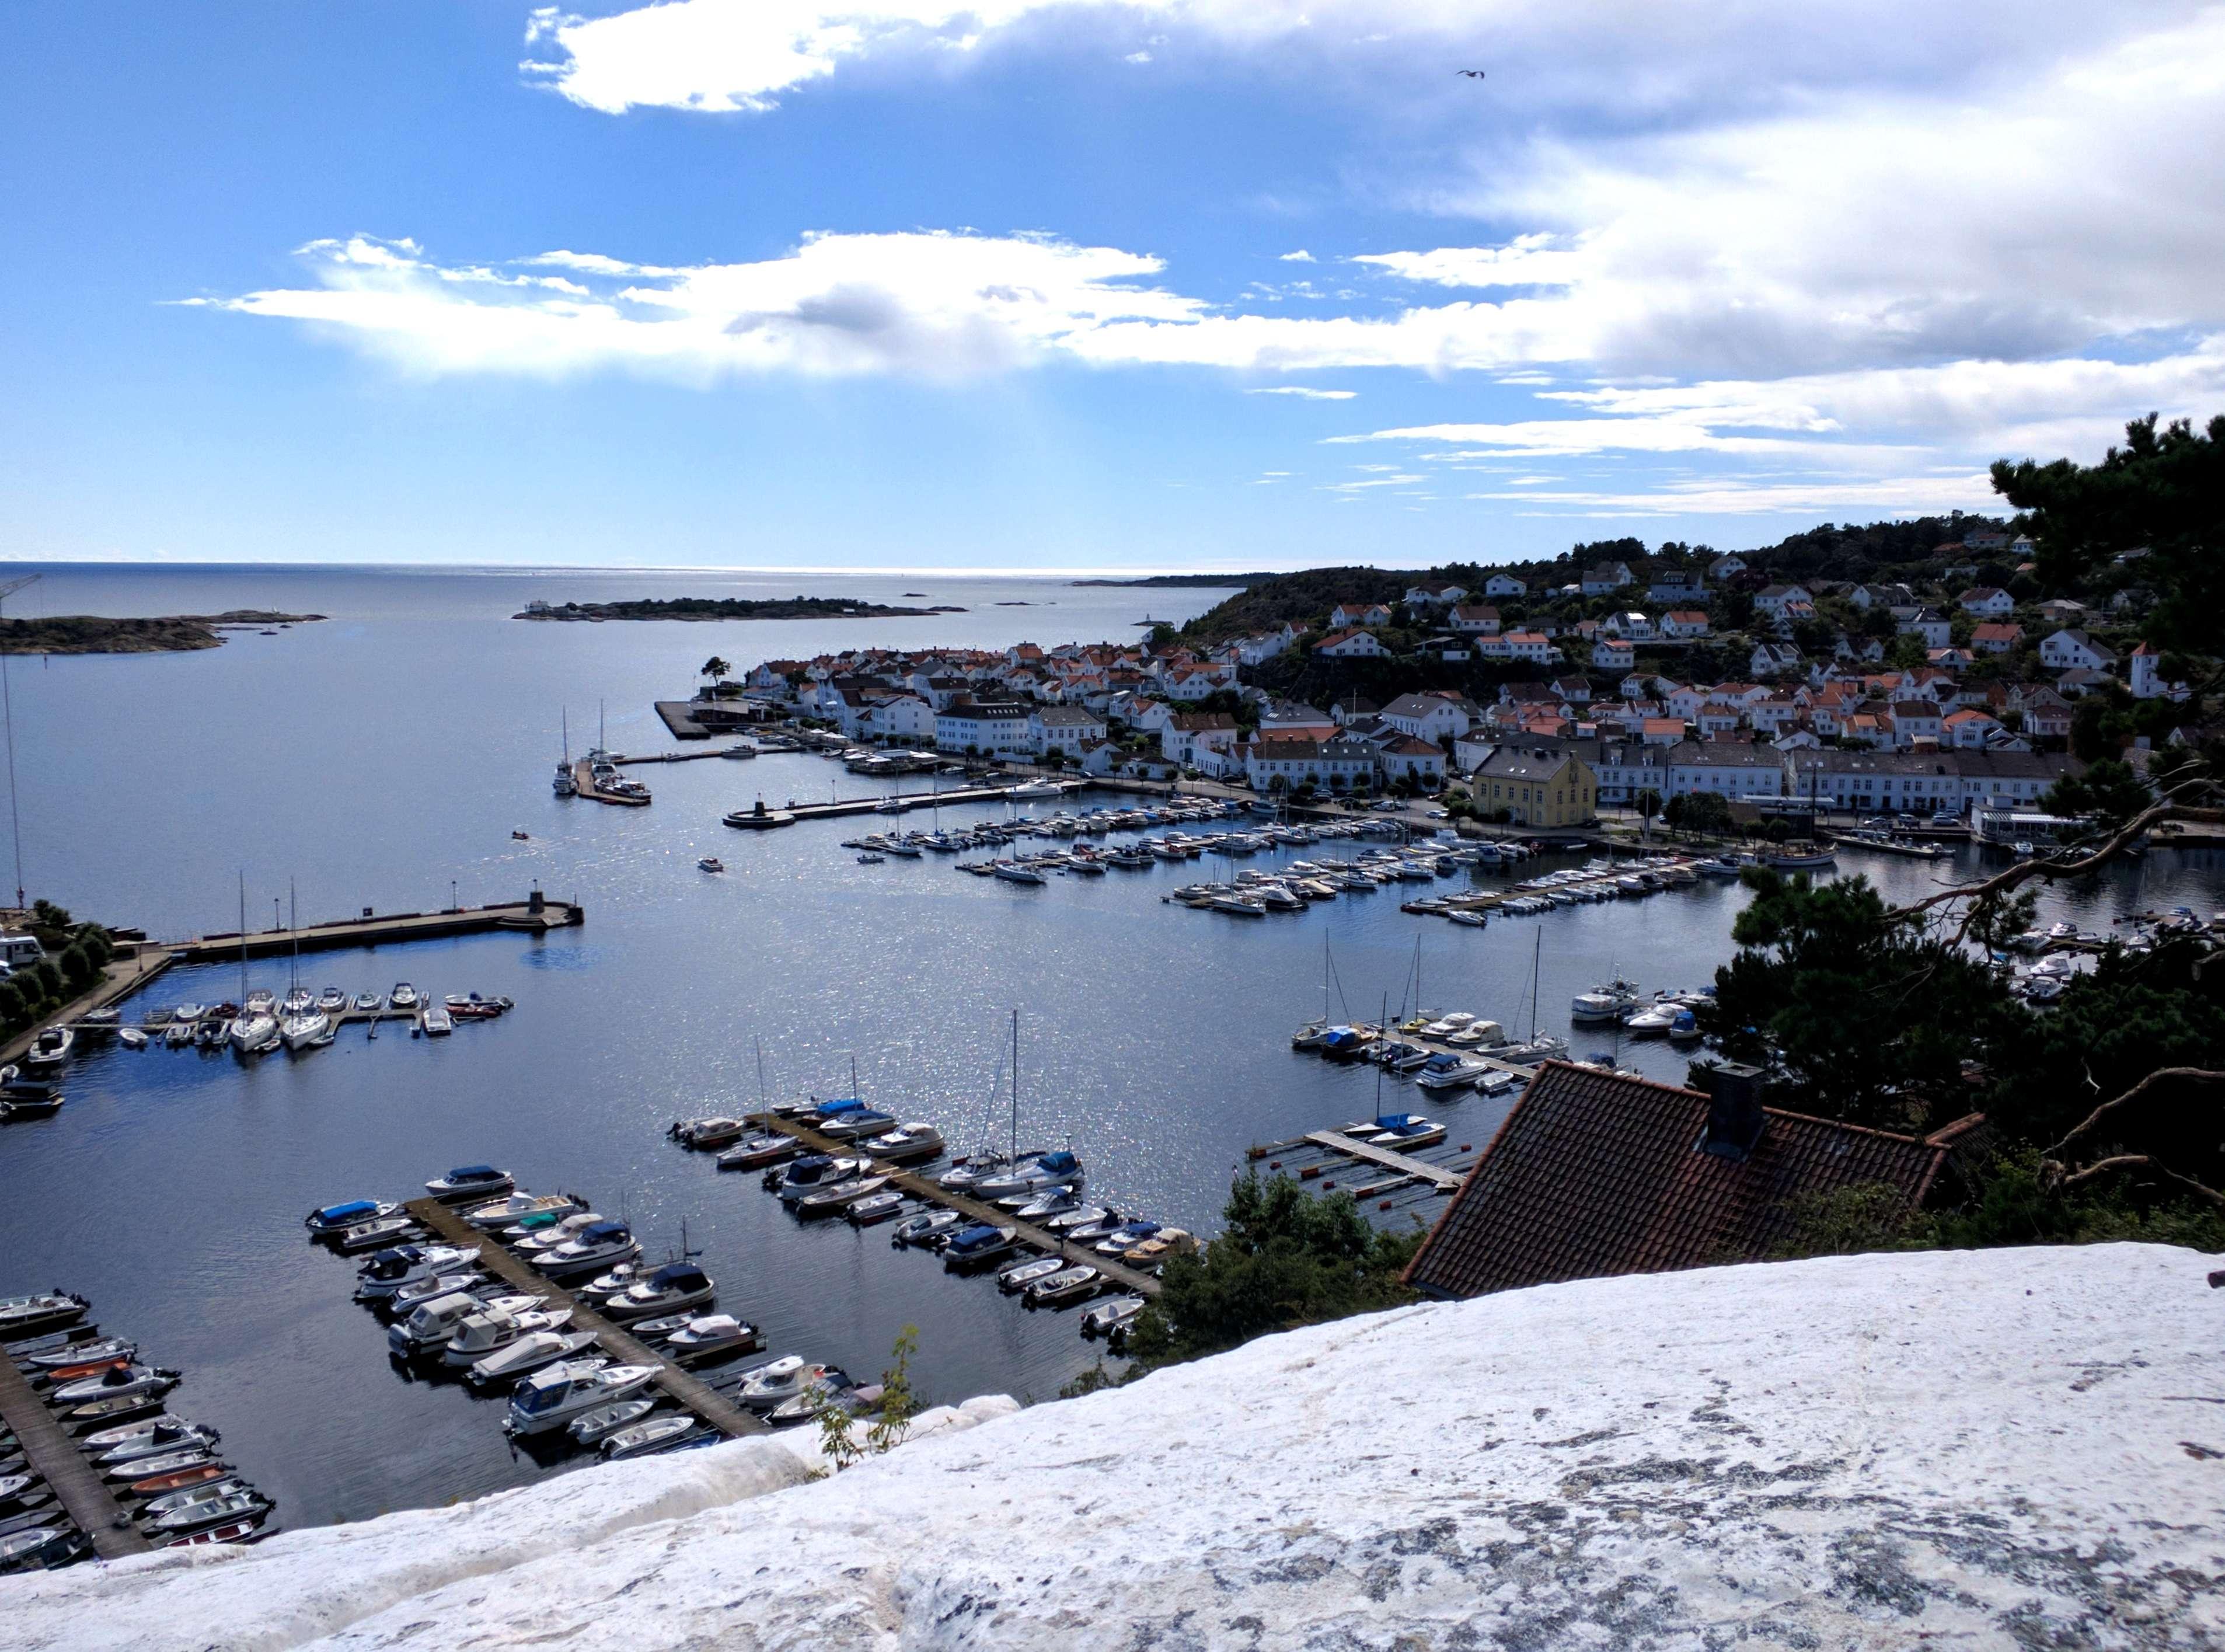 The view from Risørflekken